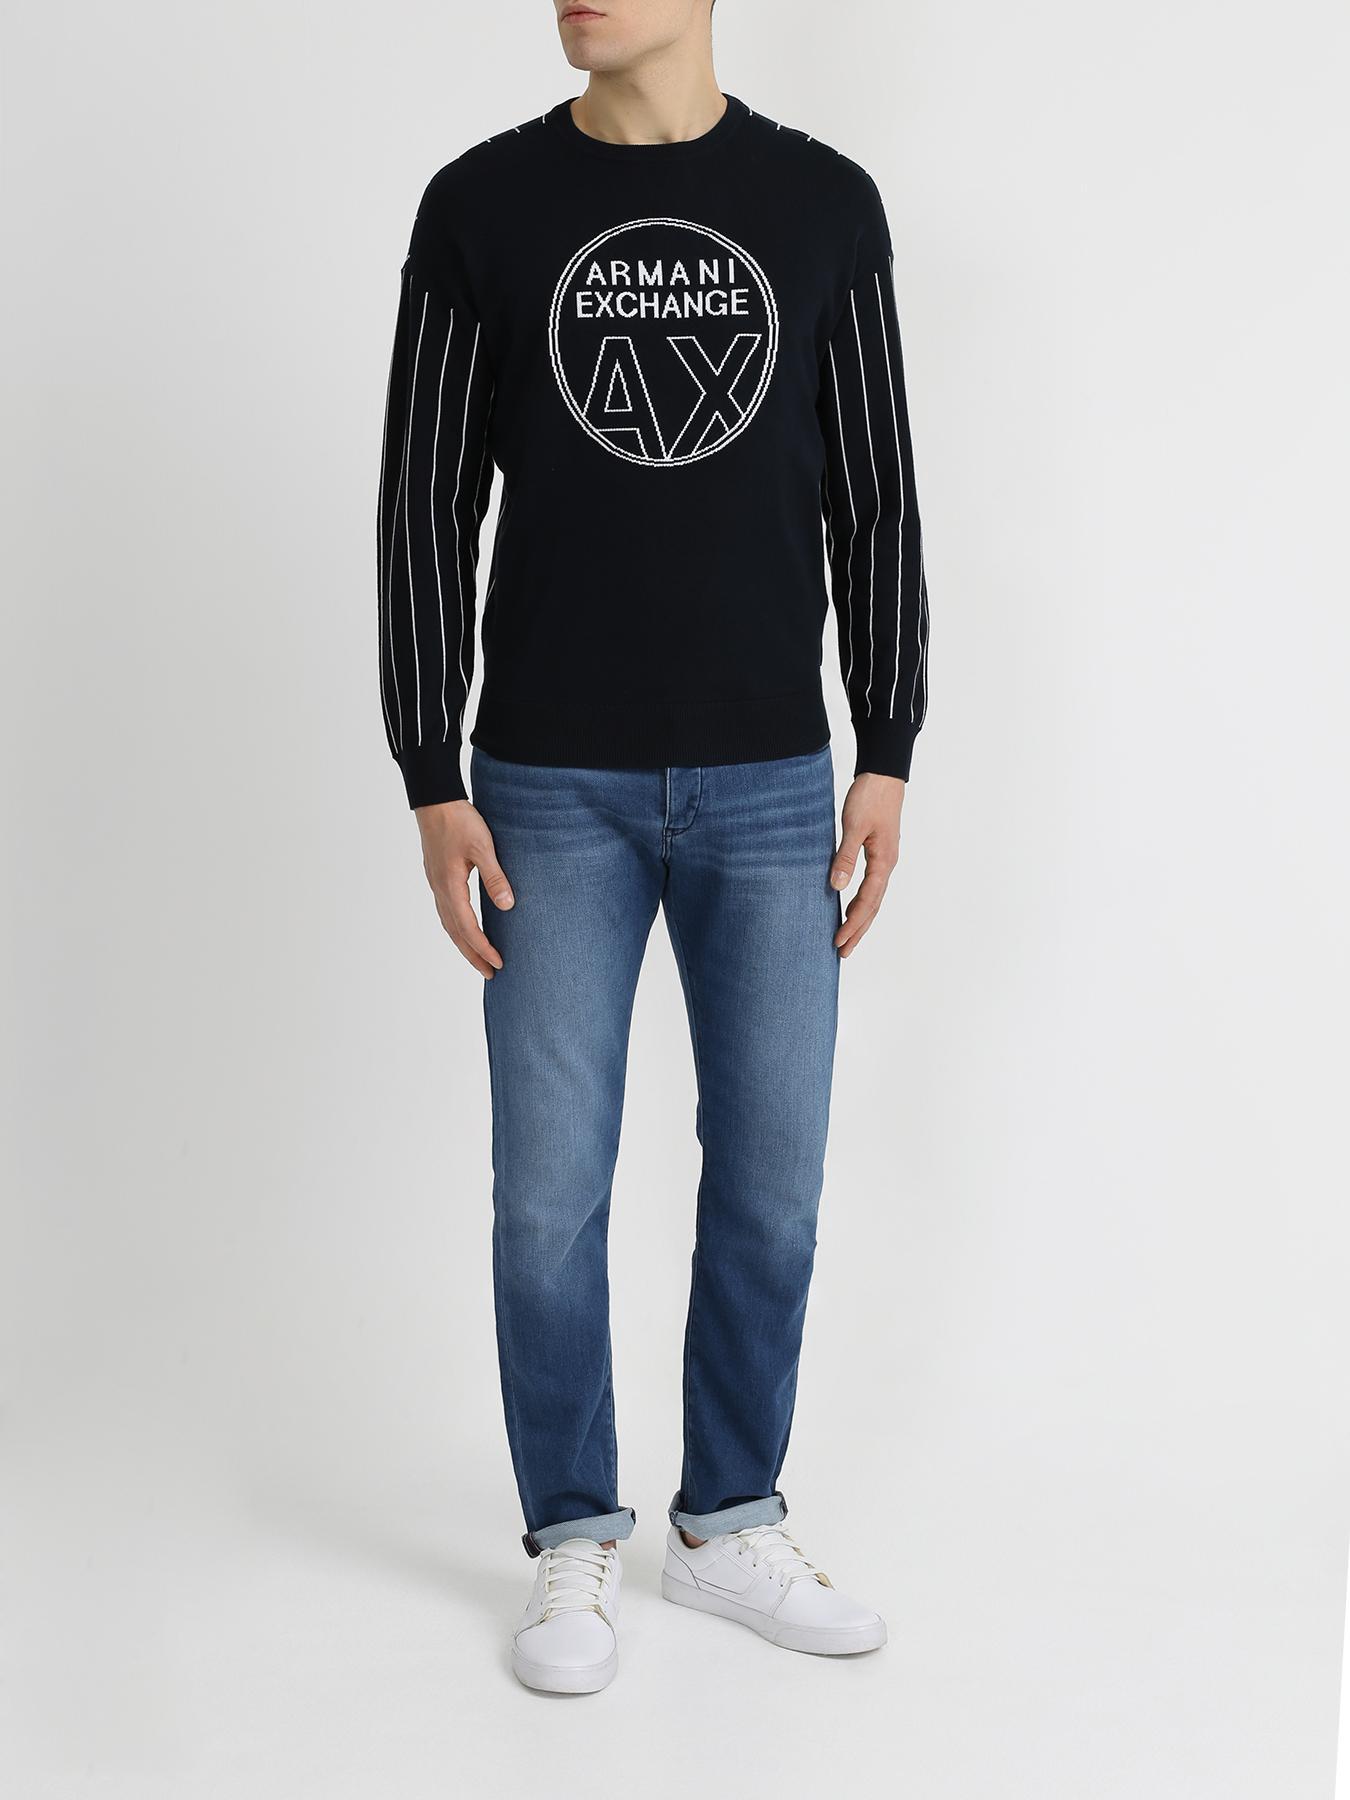 Armani Exchange Джемпер с полосками 342133-045